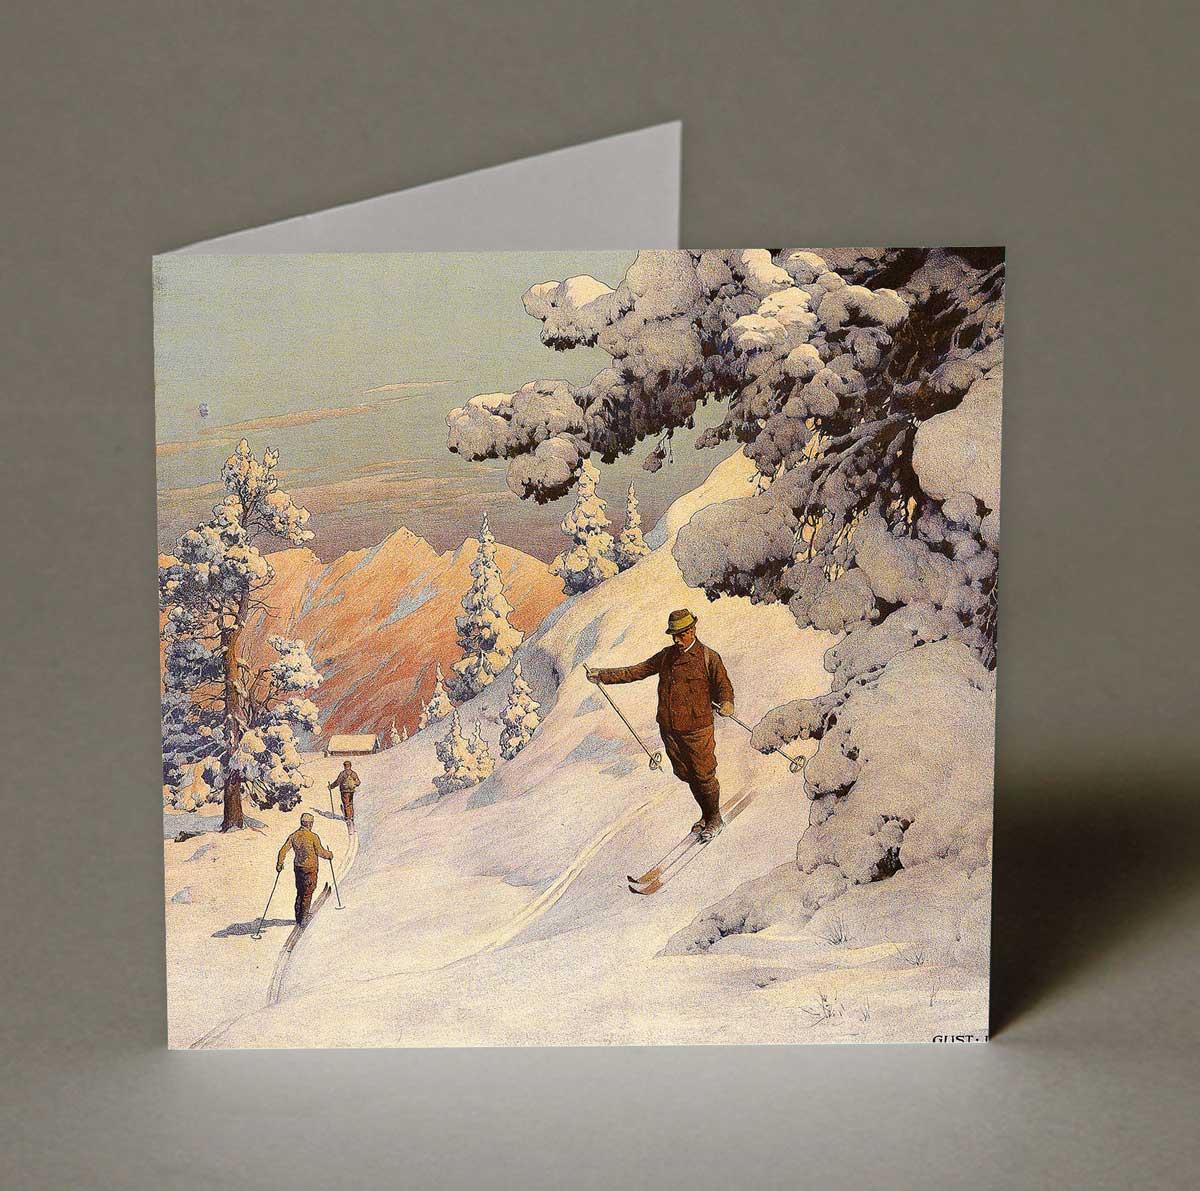 Edwardian Skiers Christmas Cards